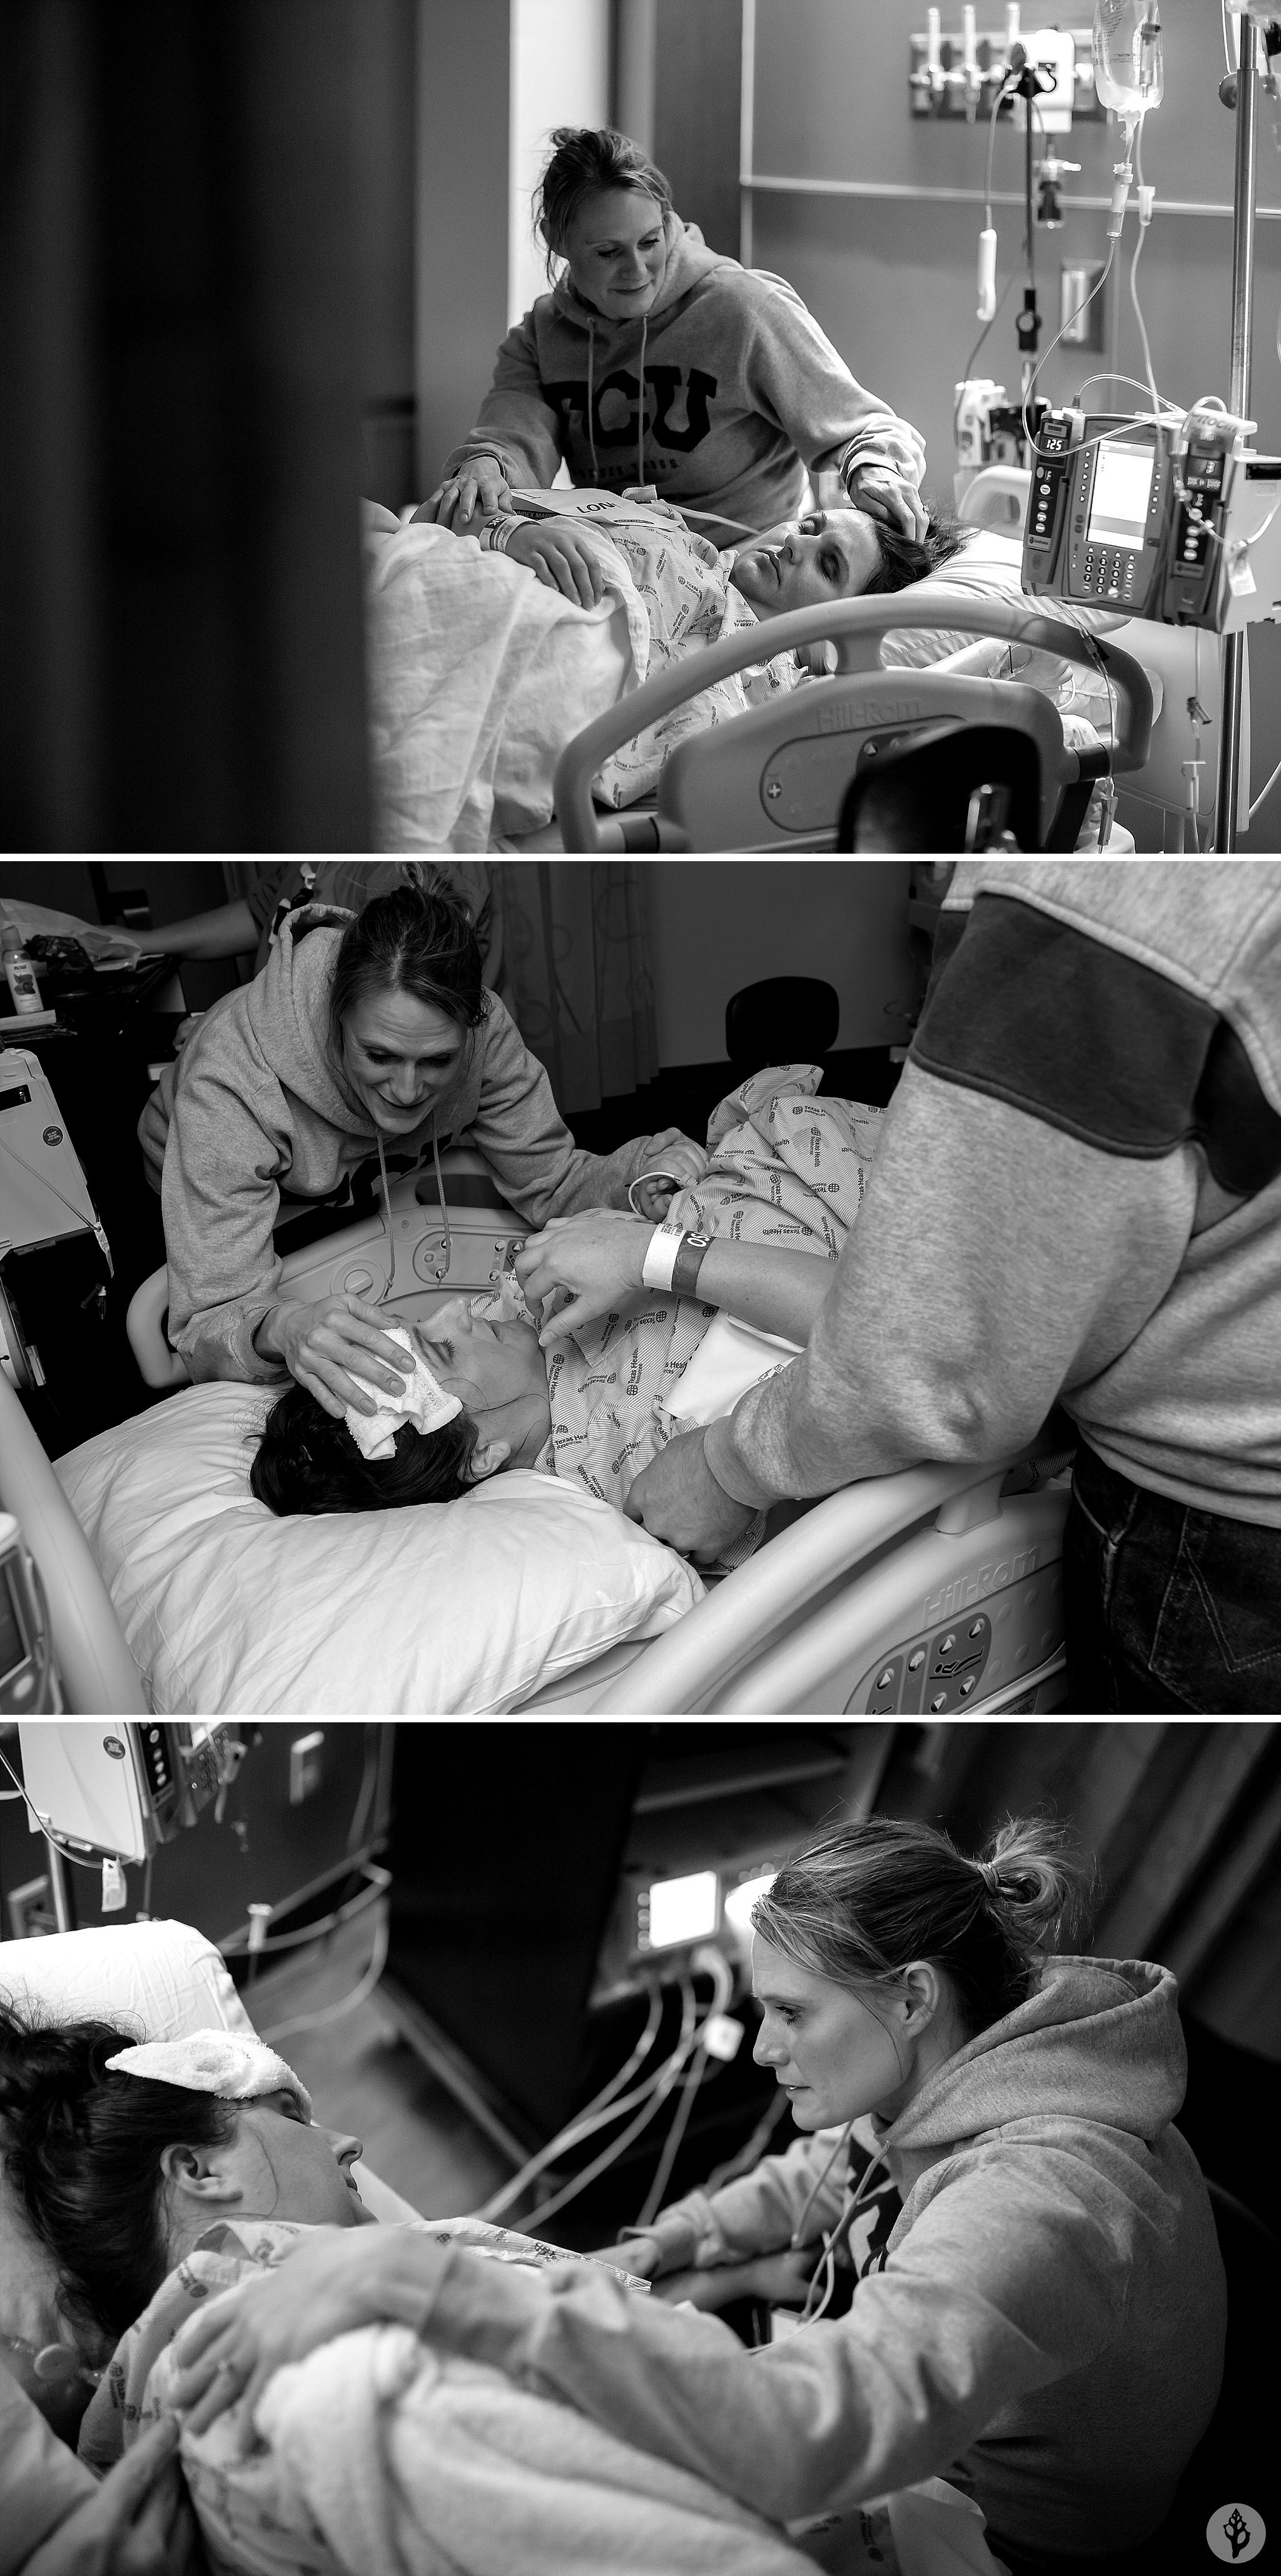 Alex Shelley Photography, DFW Birth Photographer, Dallas Fort Worth Birth Photographer, DFW Birth Photography, DFW Birth Workers, Fort Worth Birth Stories, Texas Birth Stories, Birth Becomes Her, Birth Magazine, Dallas Birth Guide, Texas Birth Network, Hospital Birth, Home Birth Photographer, C-Section Photographer, DFW Birth Stories